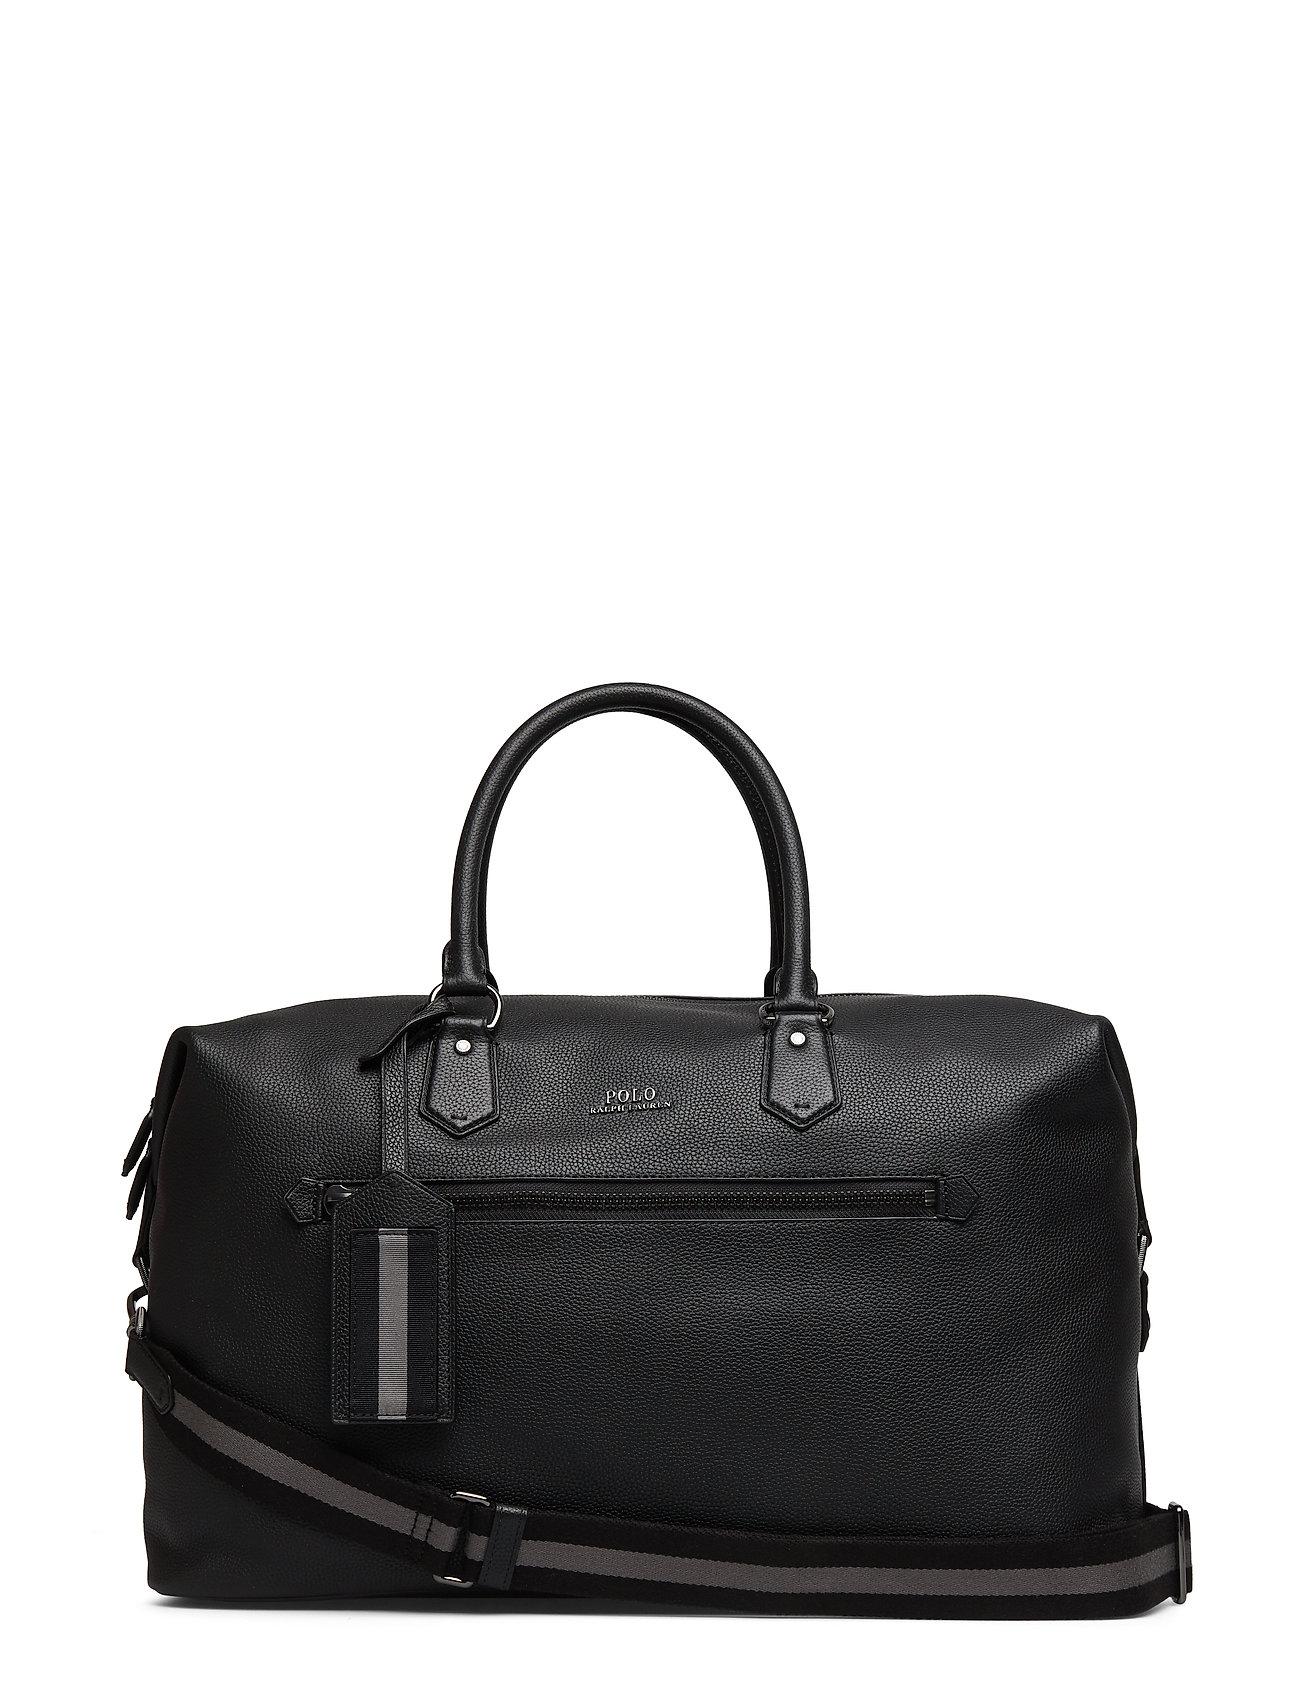 Polo Ralph Lauren Pebbled Leather Duffel Bag